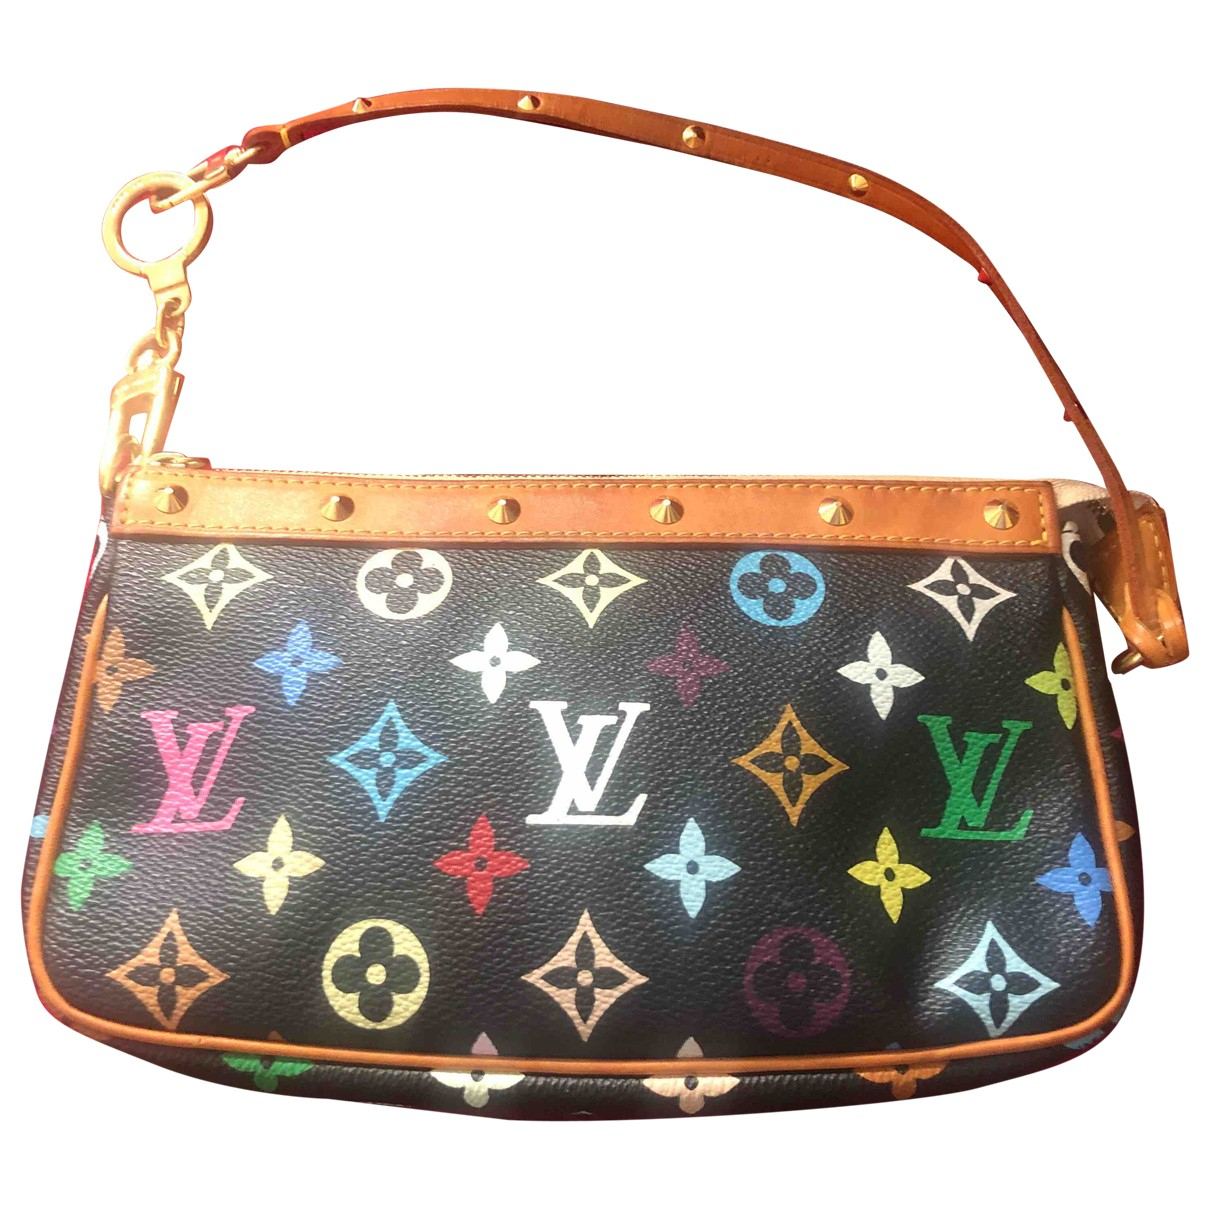 Louis Vuitton Pochette Accessoire Clutch in  Bunt Leinen